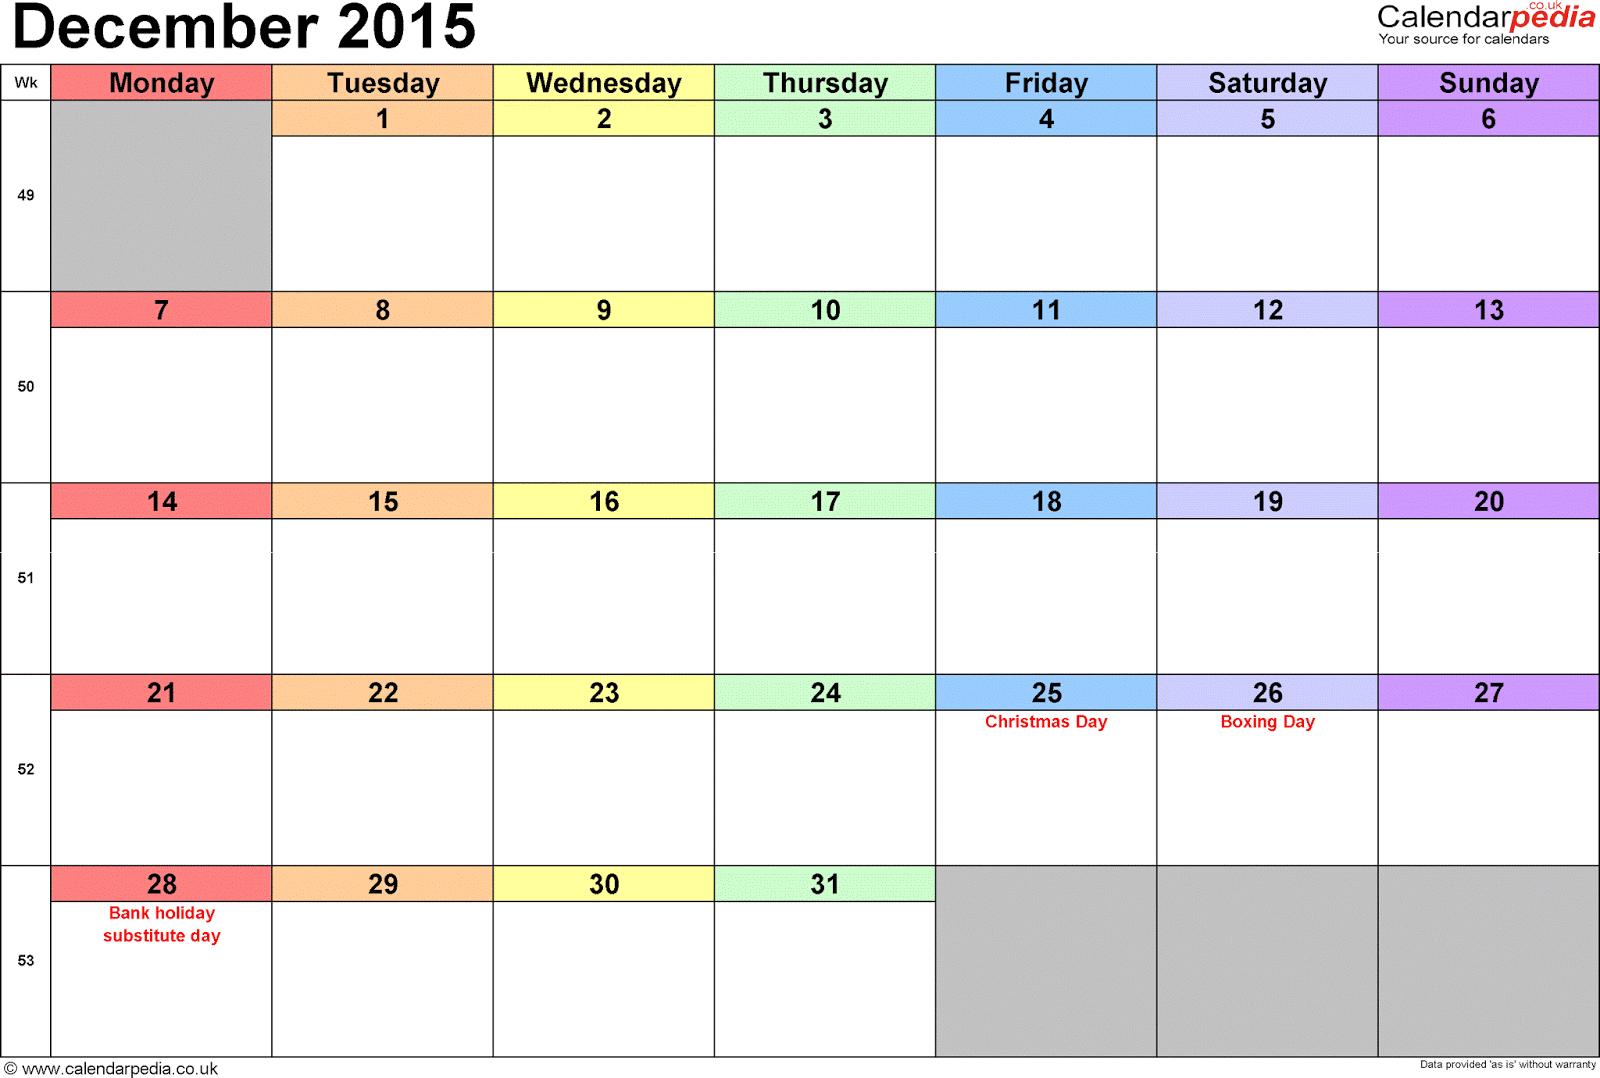 Calendar For December 2015, January 2016: December 2015 Calendar ...